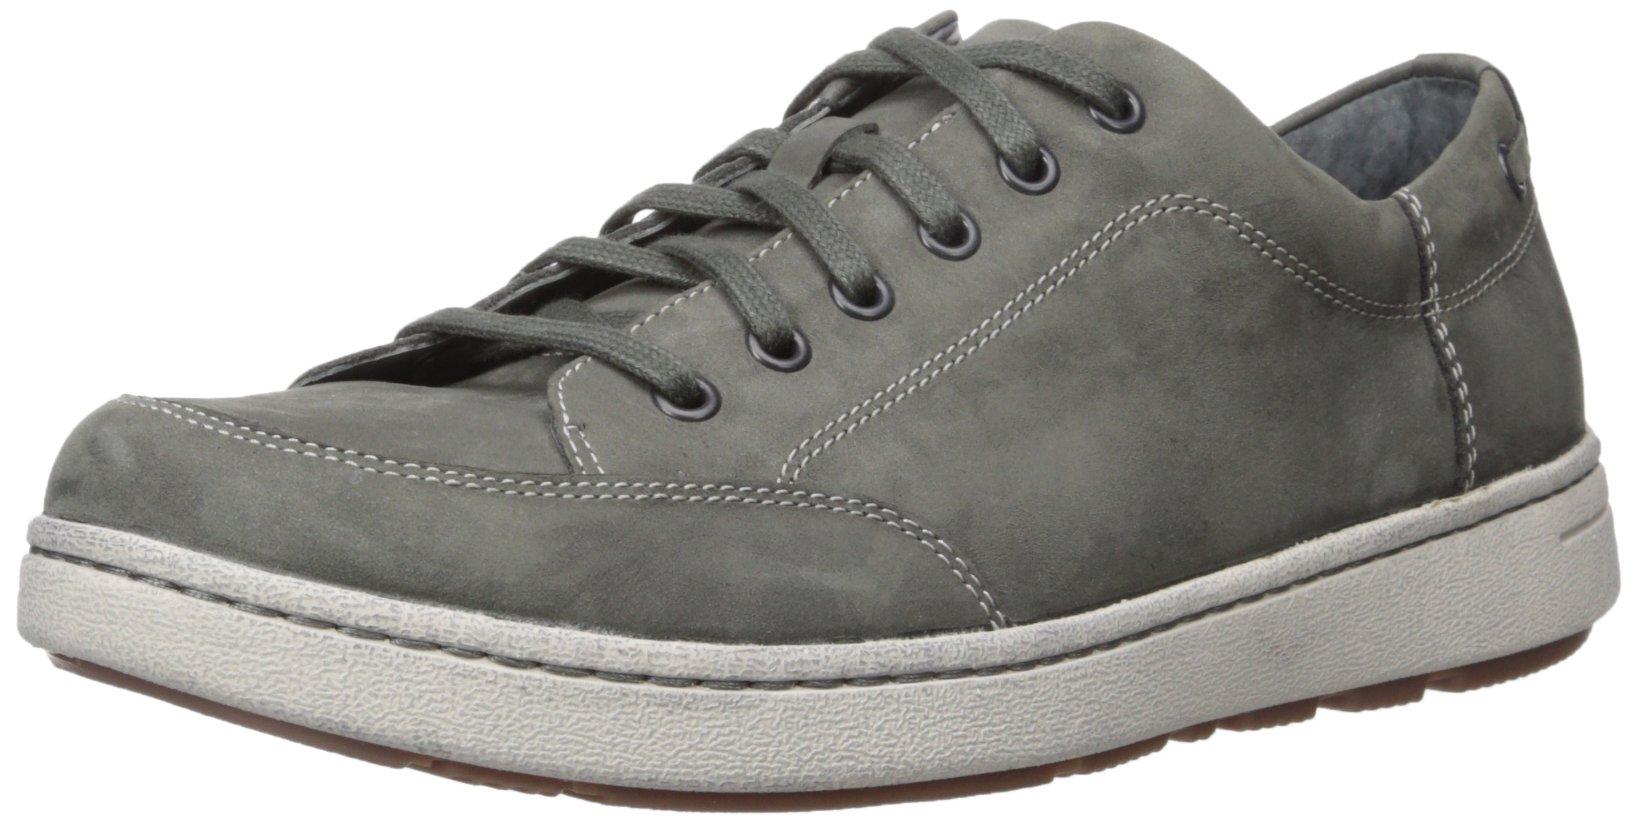 Dansko Men's Vaughn Fashion Sneaker, Grey Milled Nubuck, 44 (US Men's 10.5-11) Regular